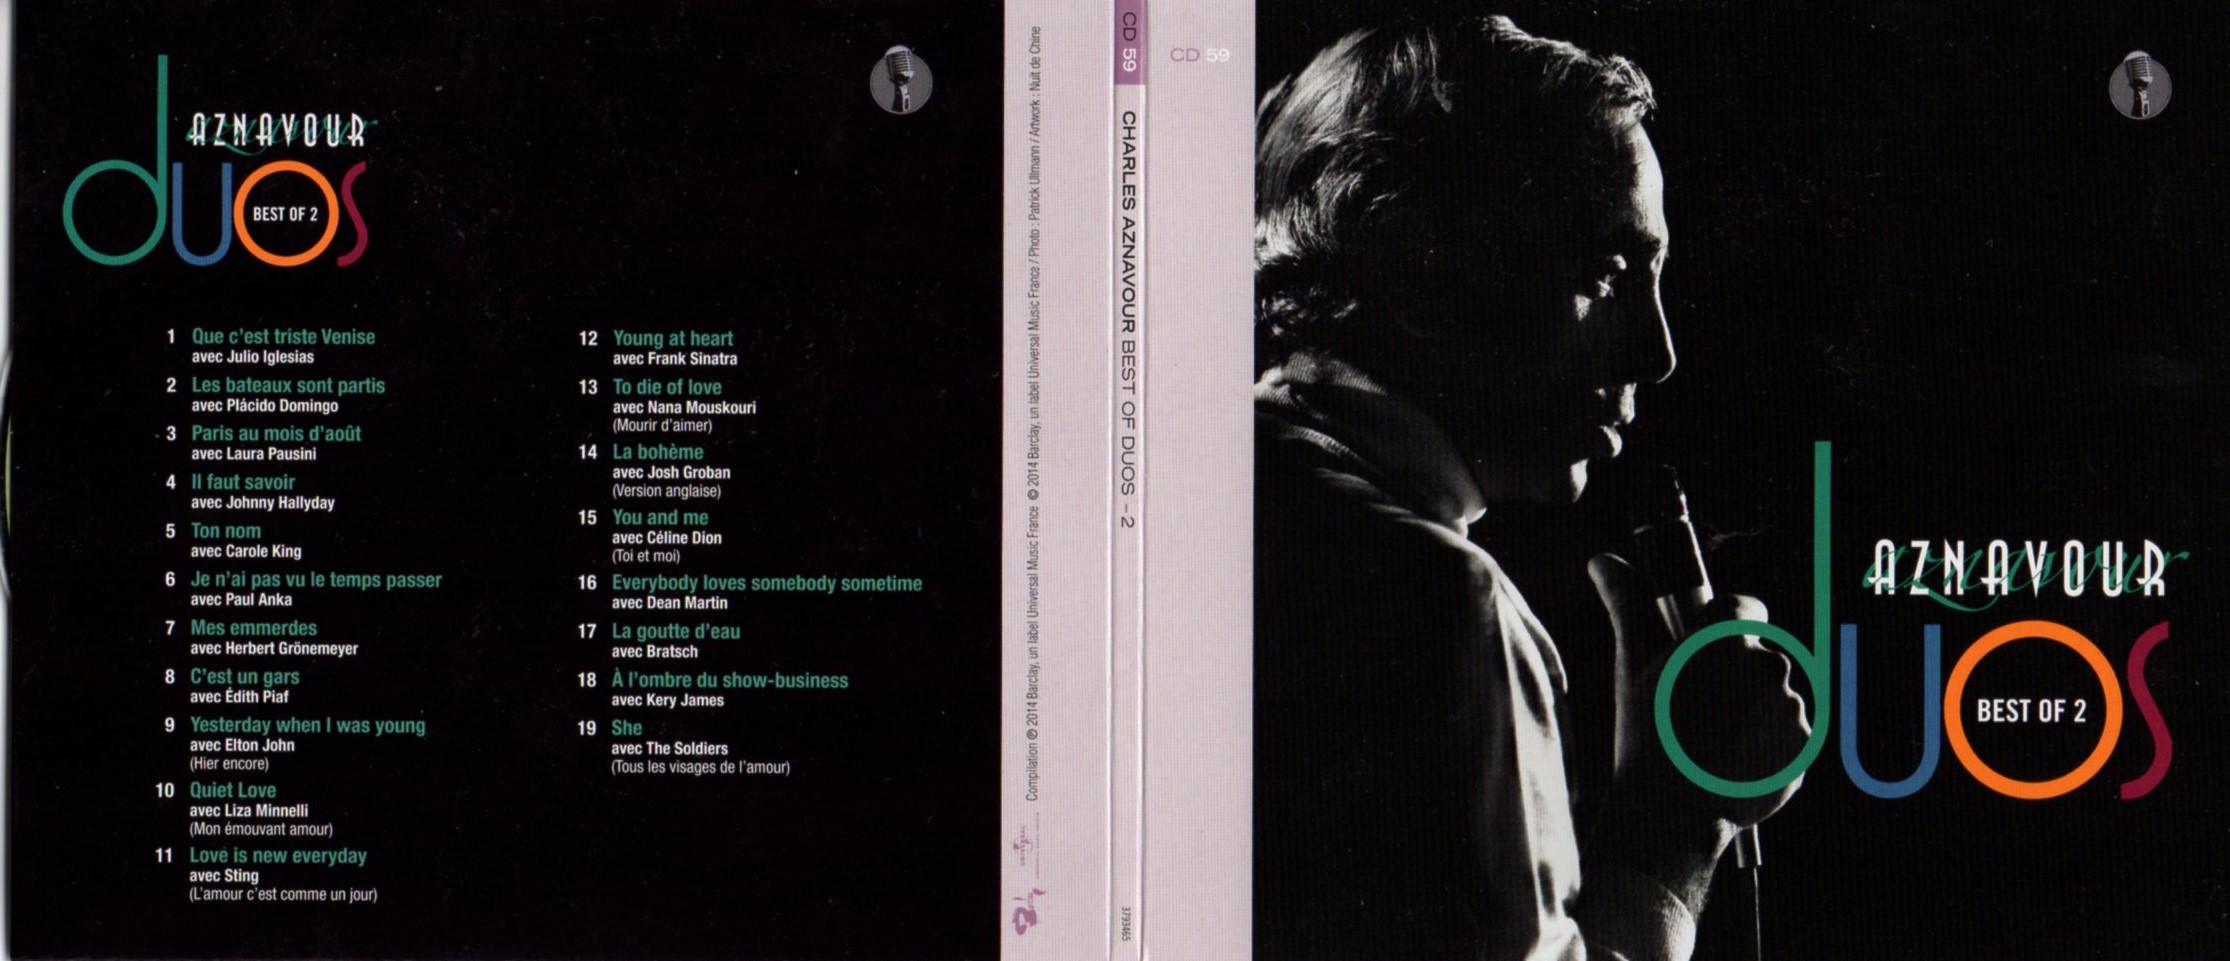 CHARLES AZNAVOUR - JOHNNY HALLYDAY - LAURA PAUSINI - Best of duos Vol 2 Gatefold Card board sleeve - CD